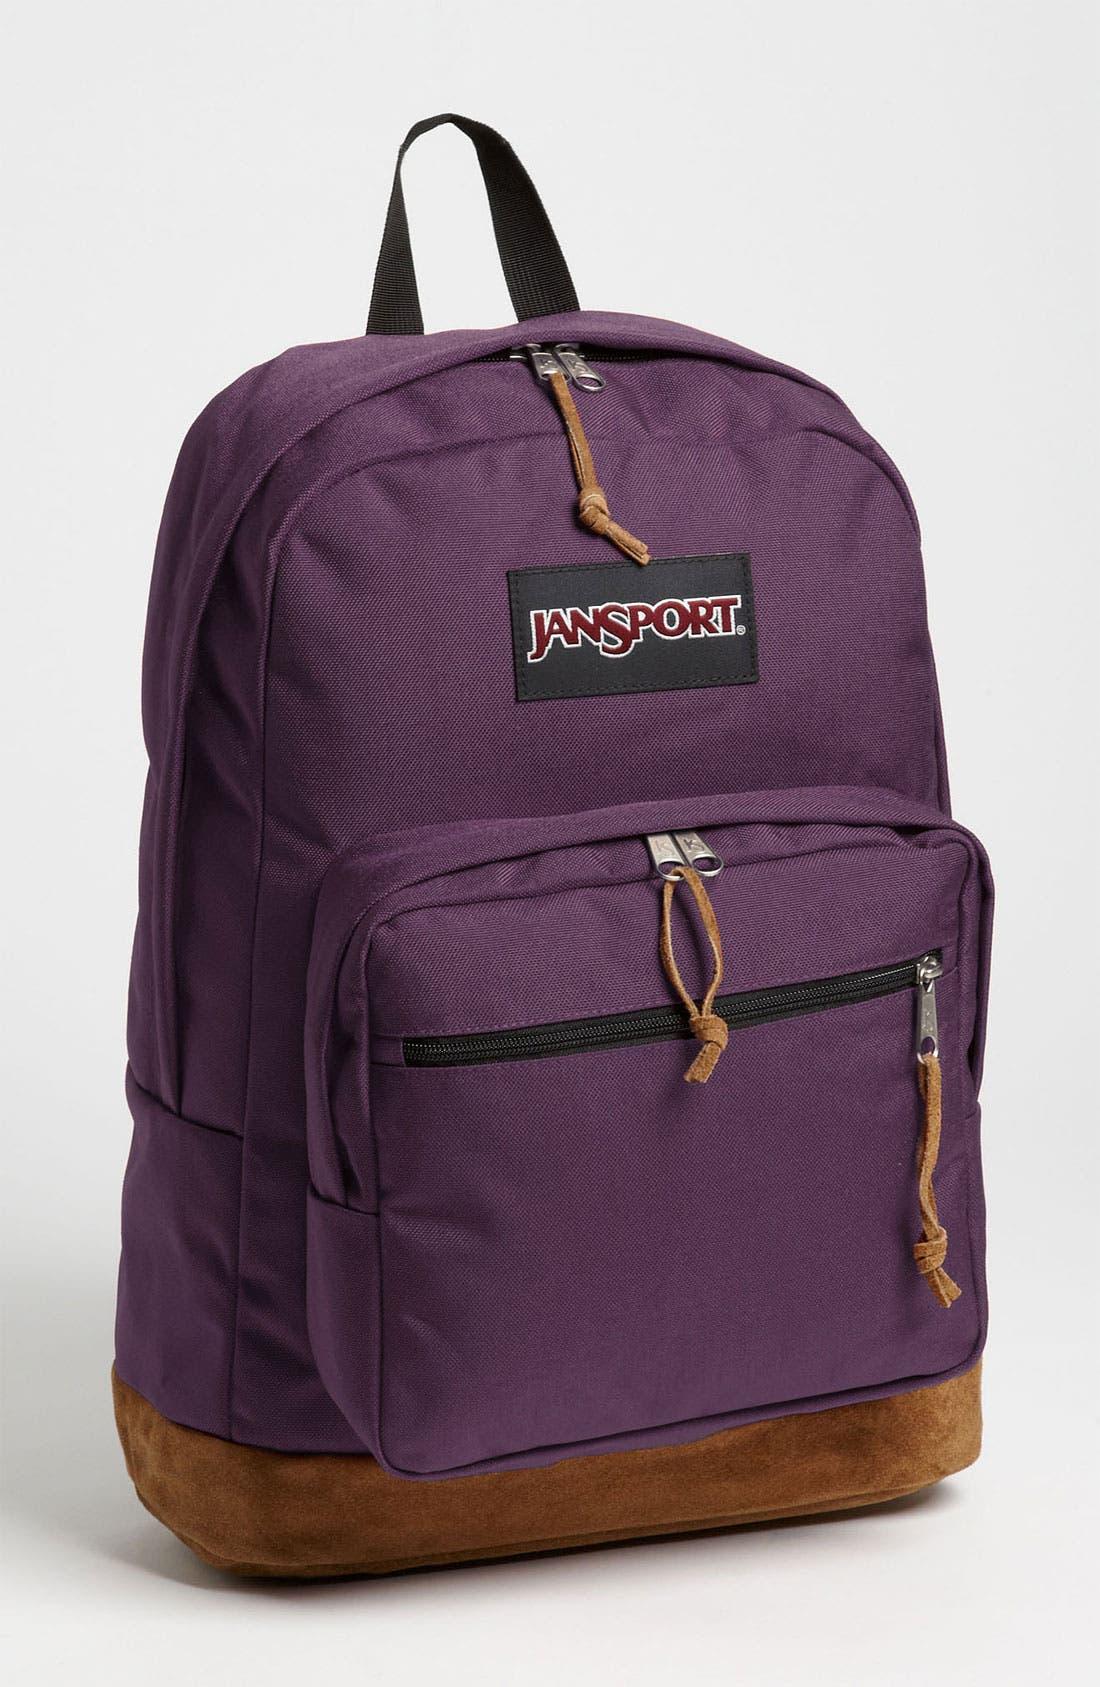 Alternate Image 1 Selected - Jansport 'Right' Backpack